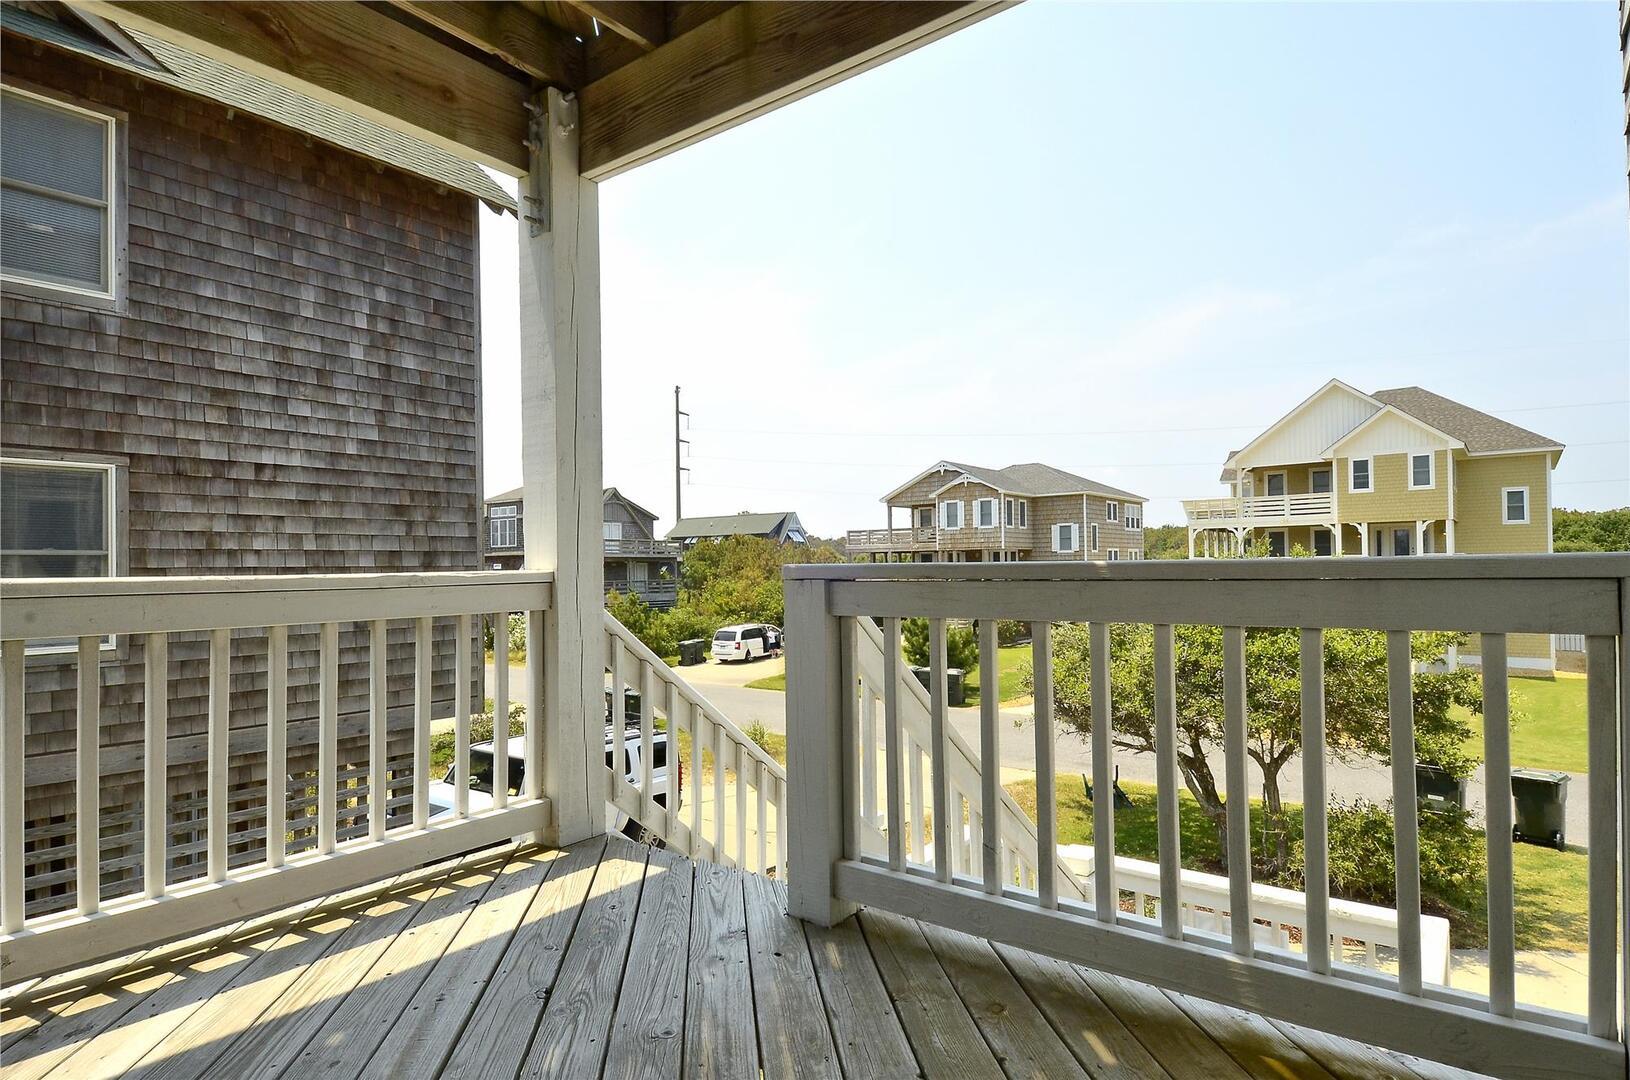 Middle Level,Porch,